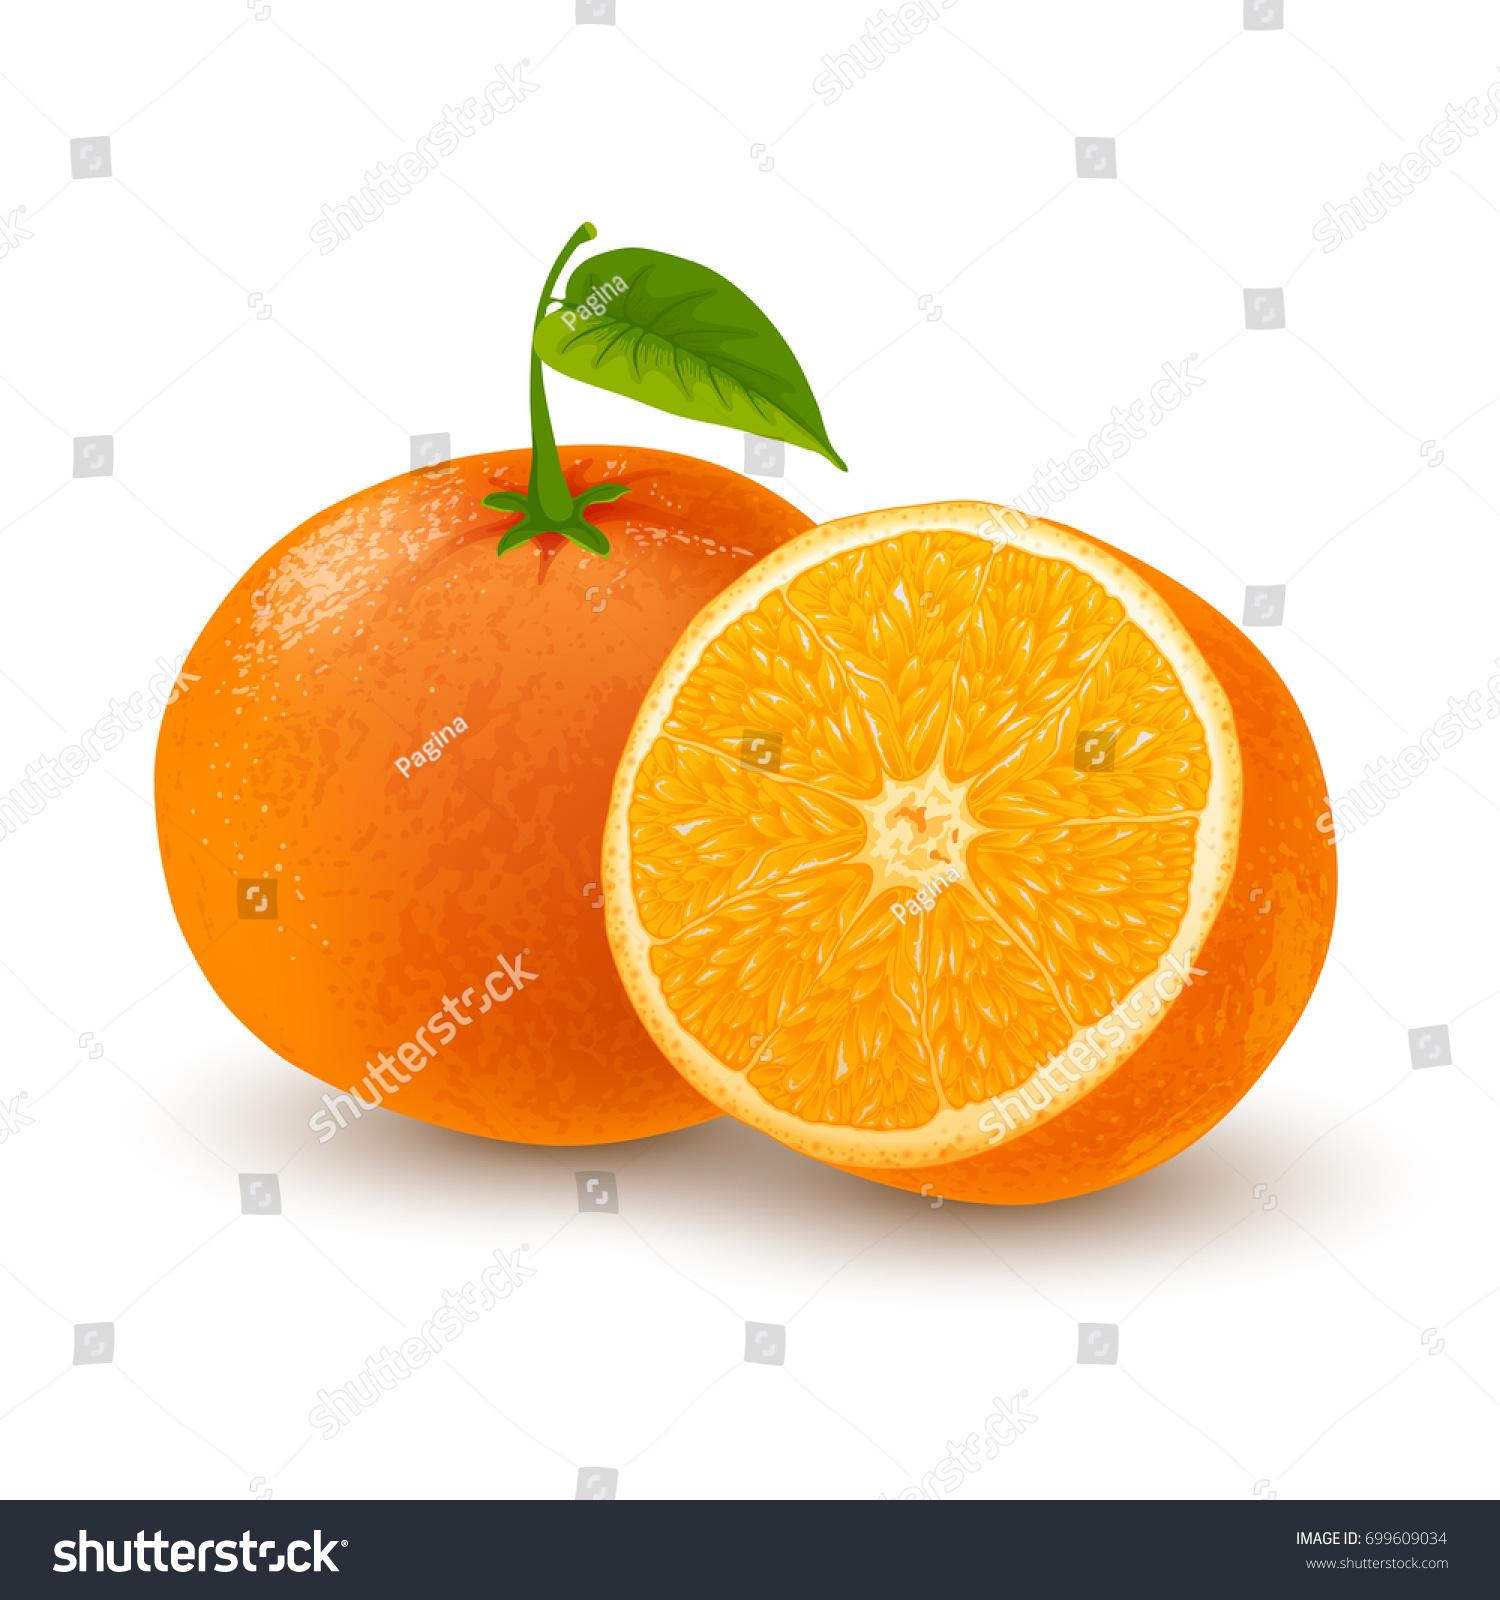 Fresh Ripe Orange Tangerine Whole Leaf Stock Vector HD (Royalty Free ...